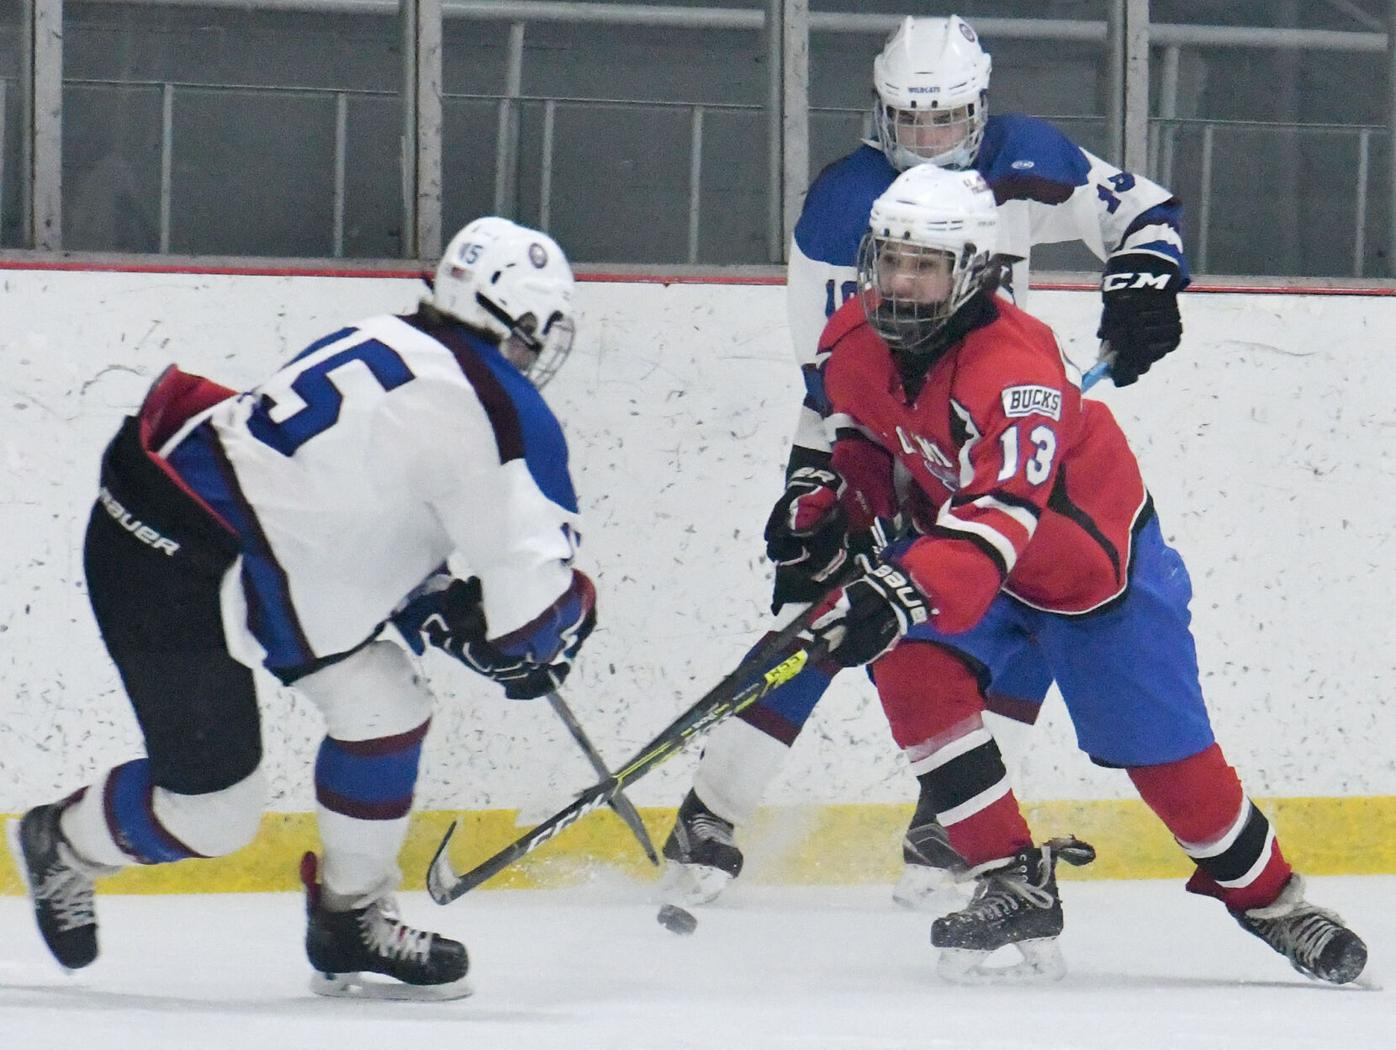 031721 EO SU Boys Hockey 02.jpg